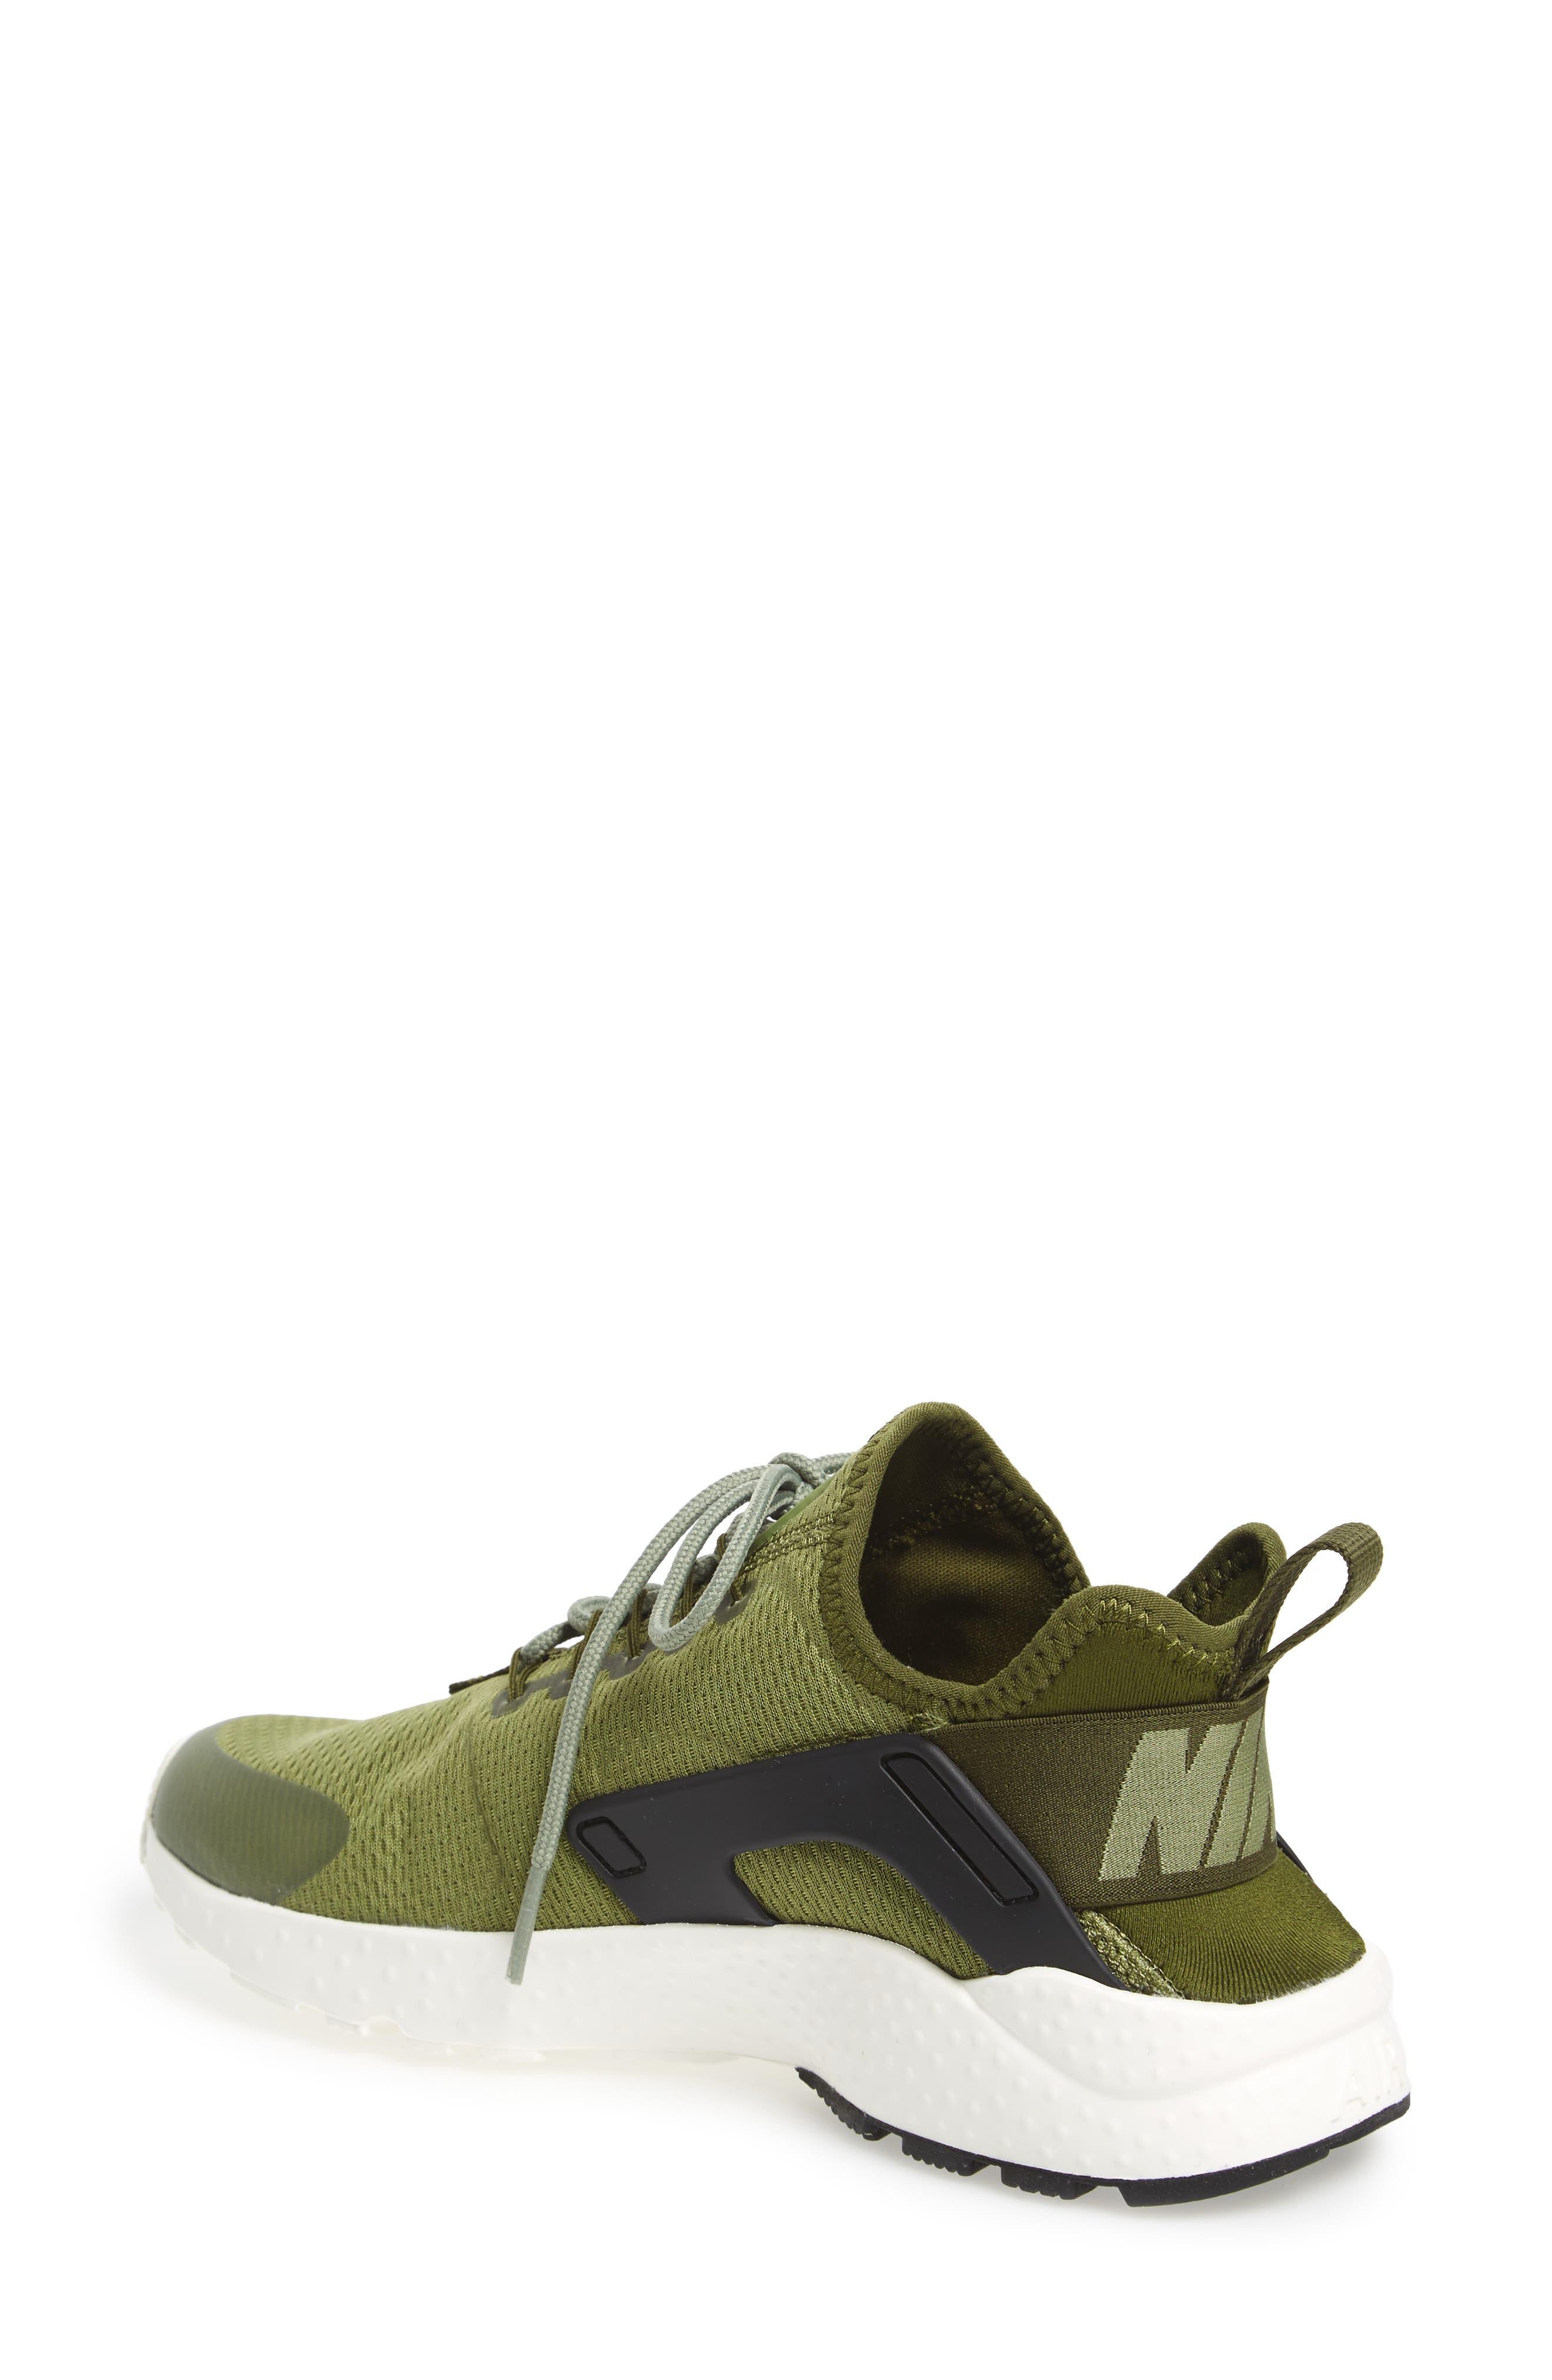 Air Huarache Sneaker,                             Alternate thumbnail 68, color,